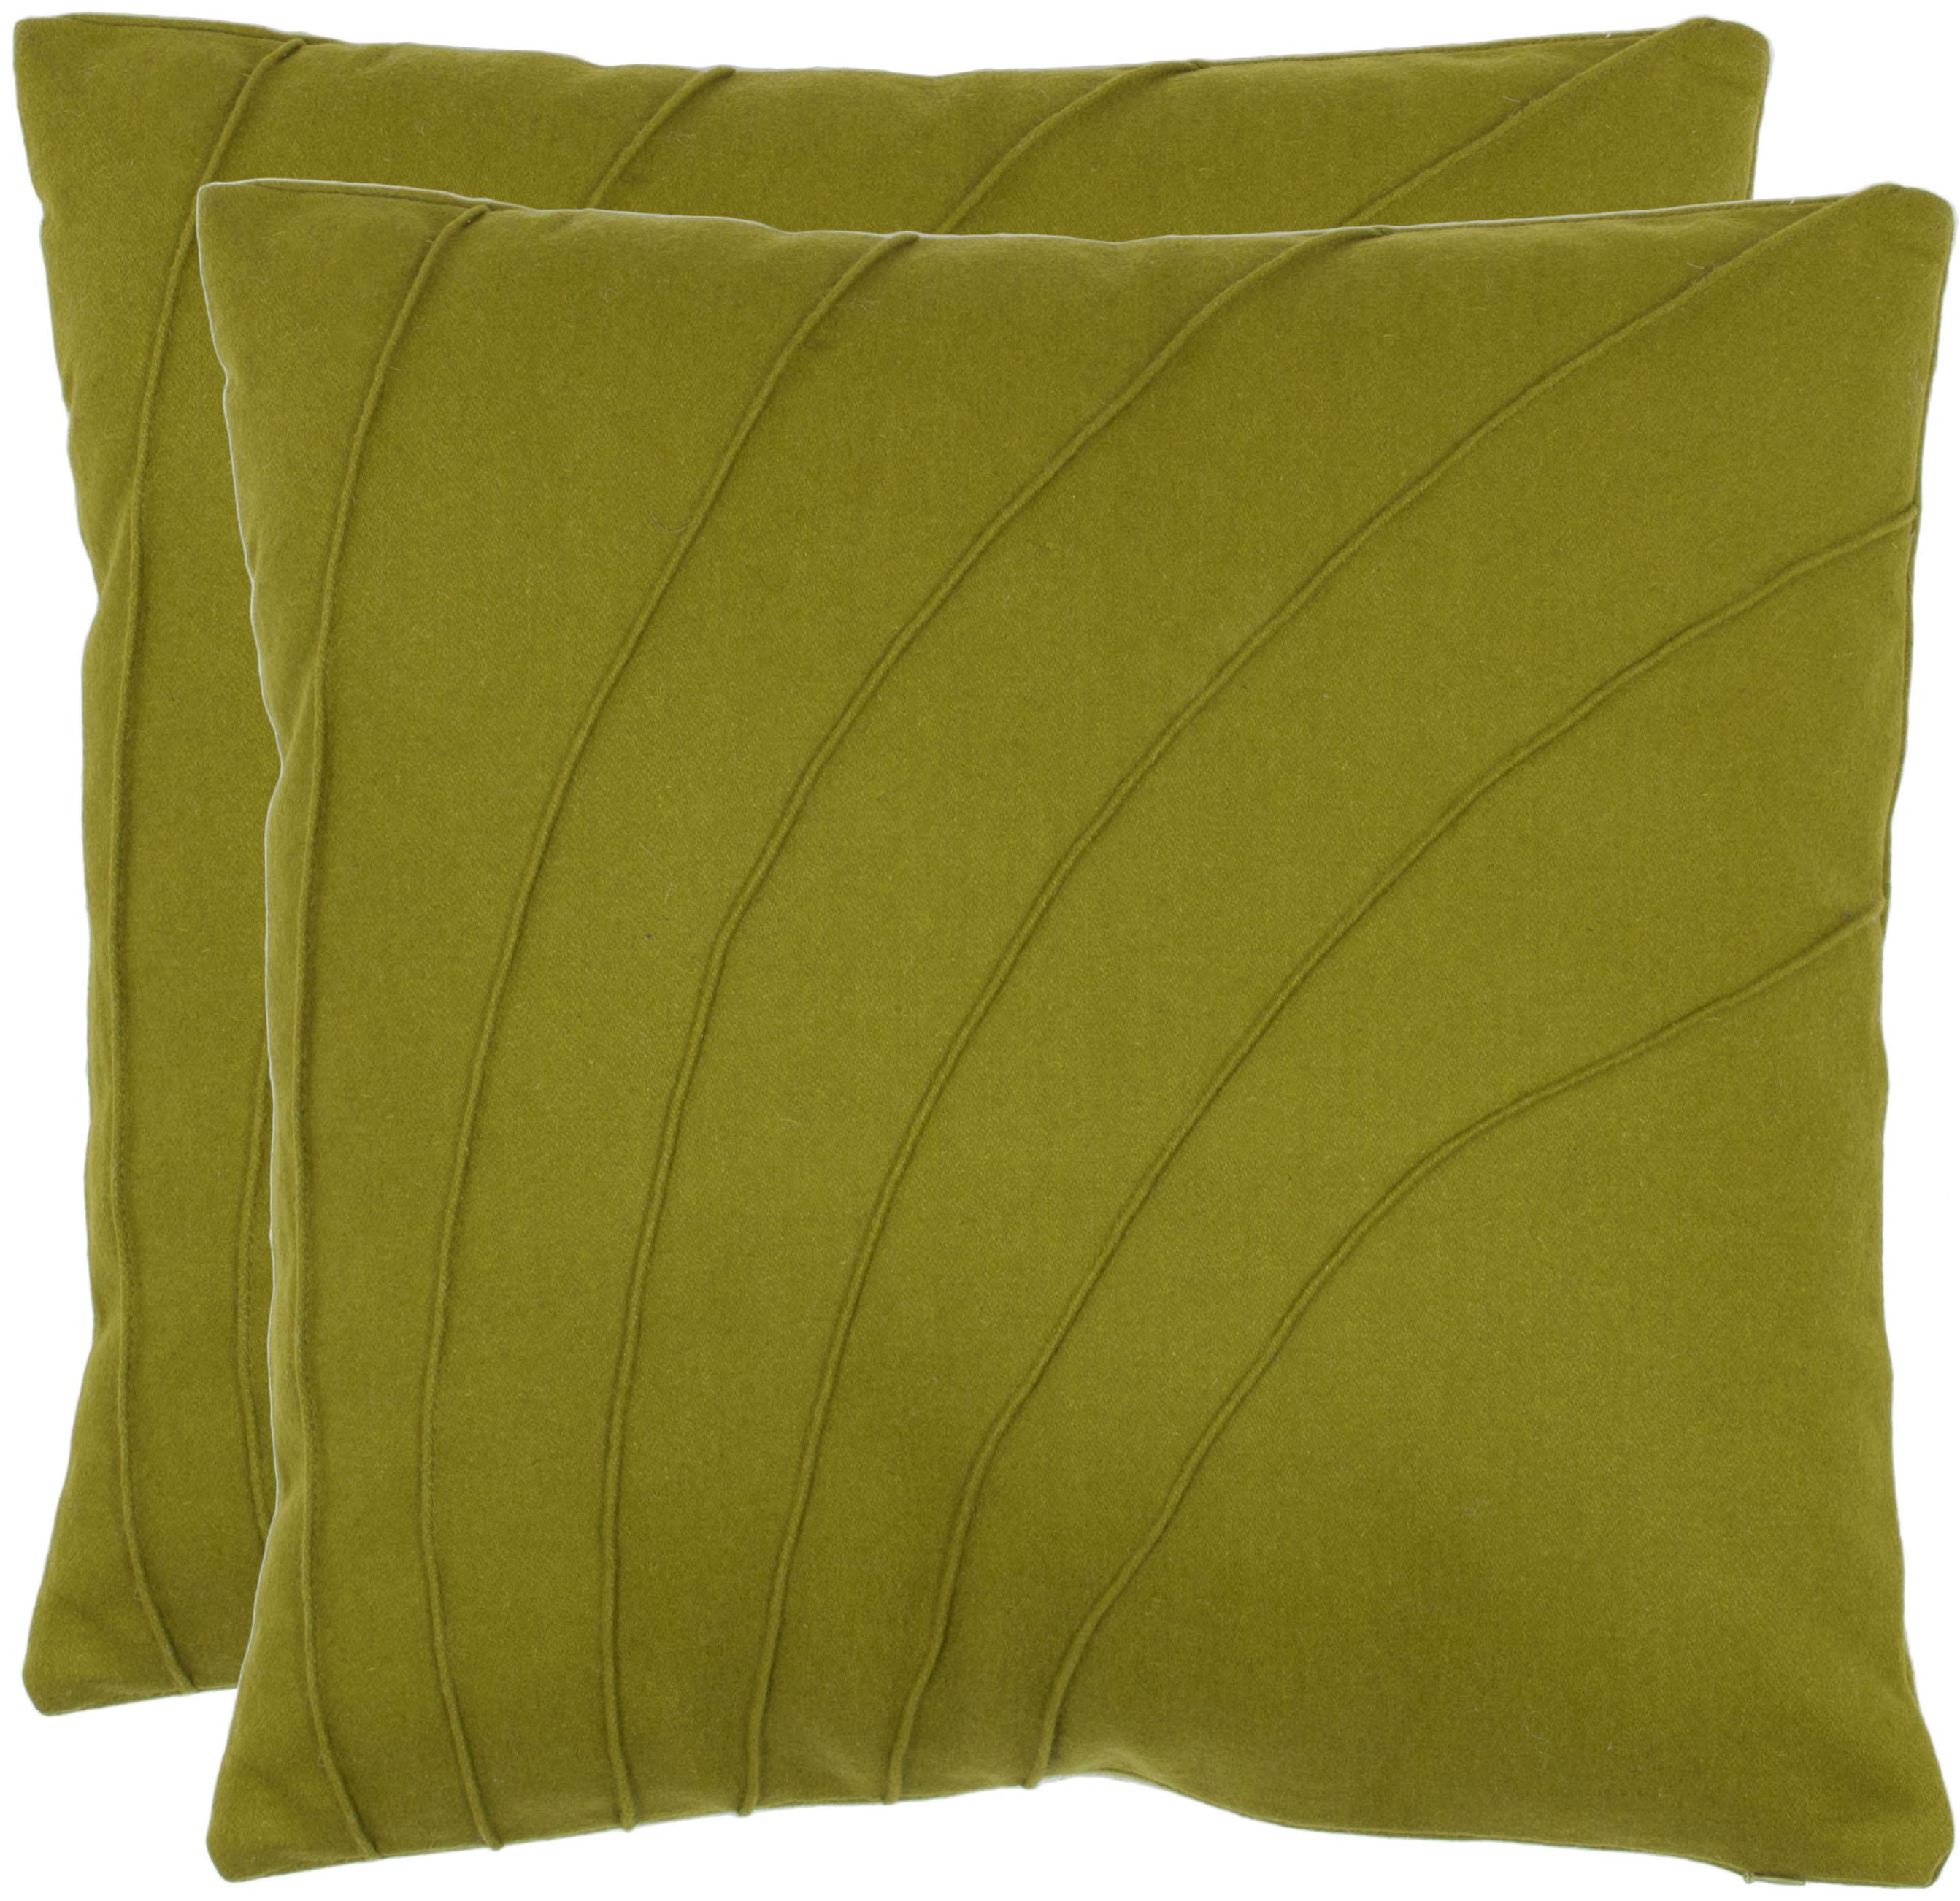 Safavieh Flora Textured Pillow, Set of 2